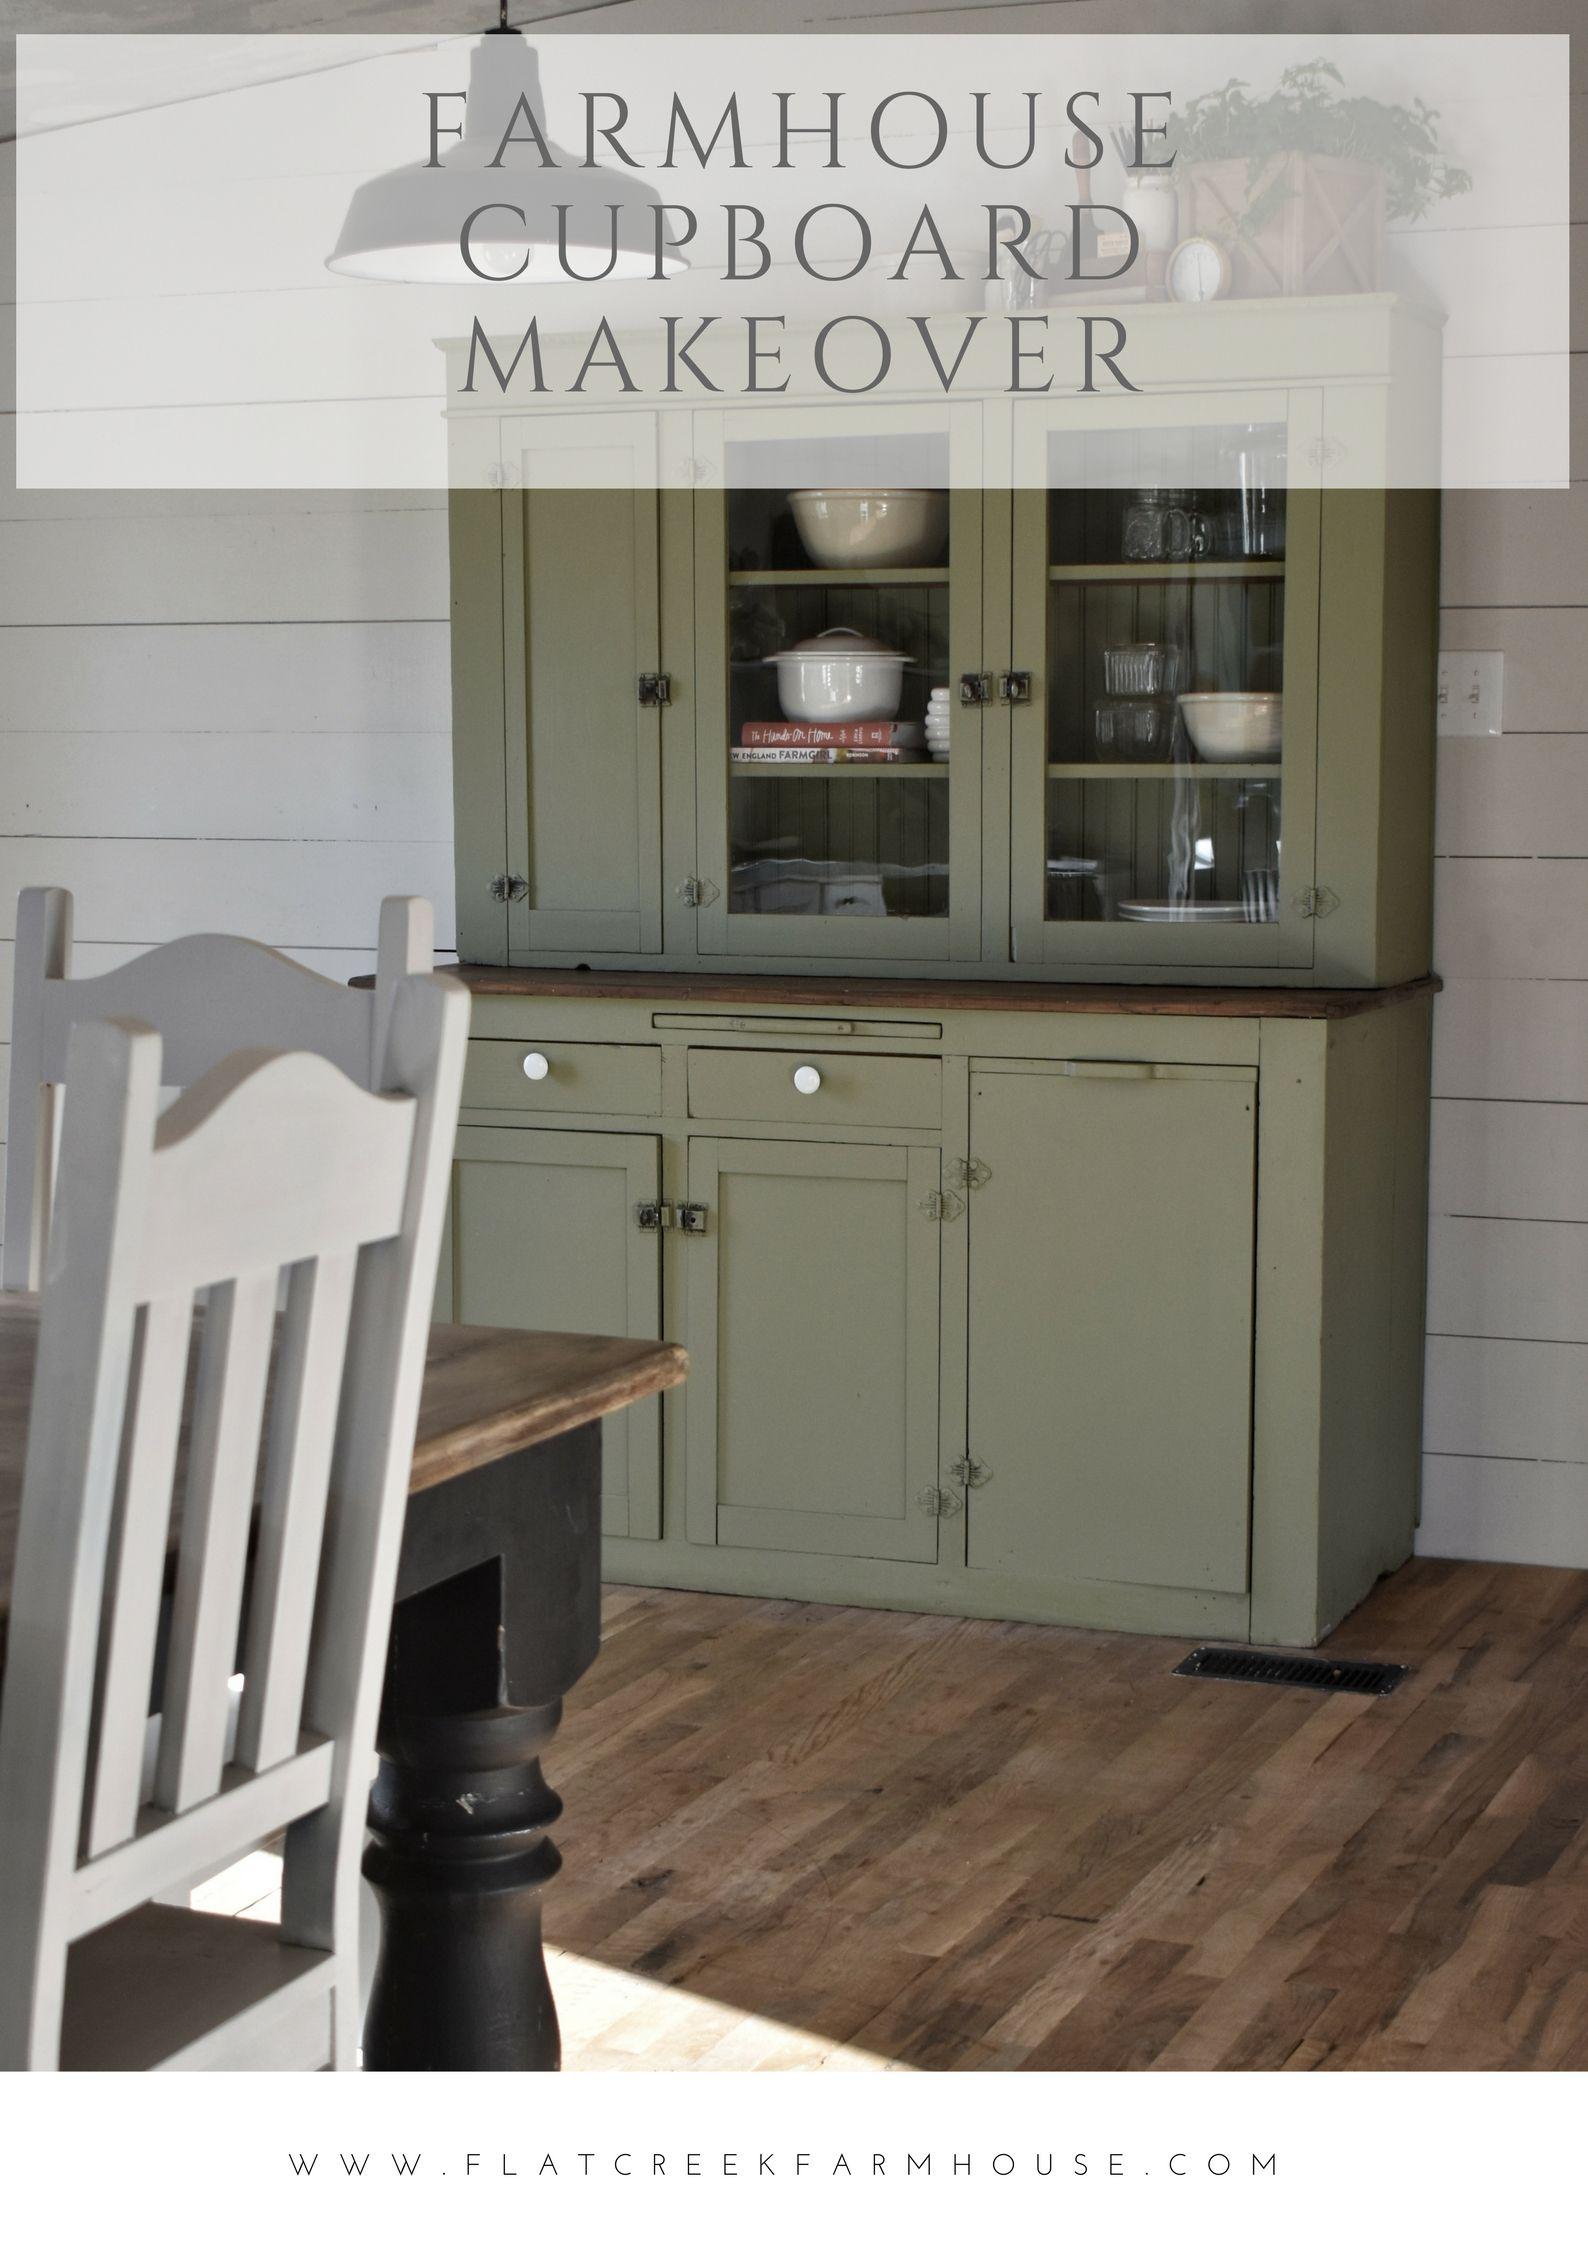 Farmhouse Cupboard Makeover Cupboard makeover, Farmhouse